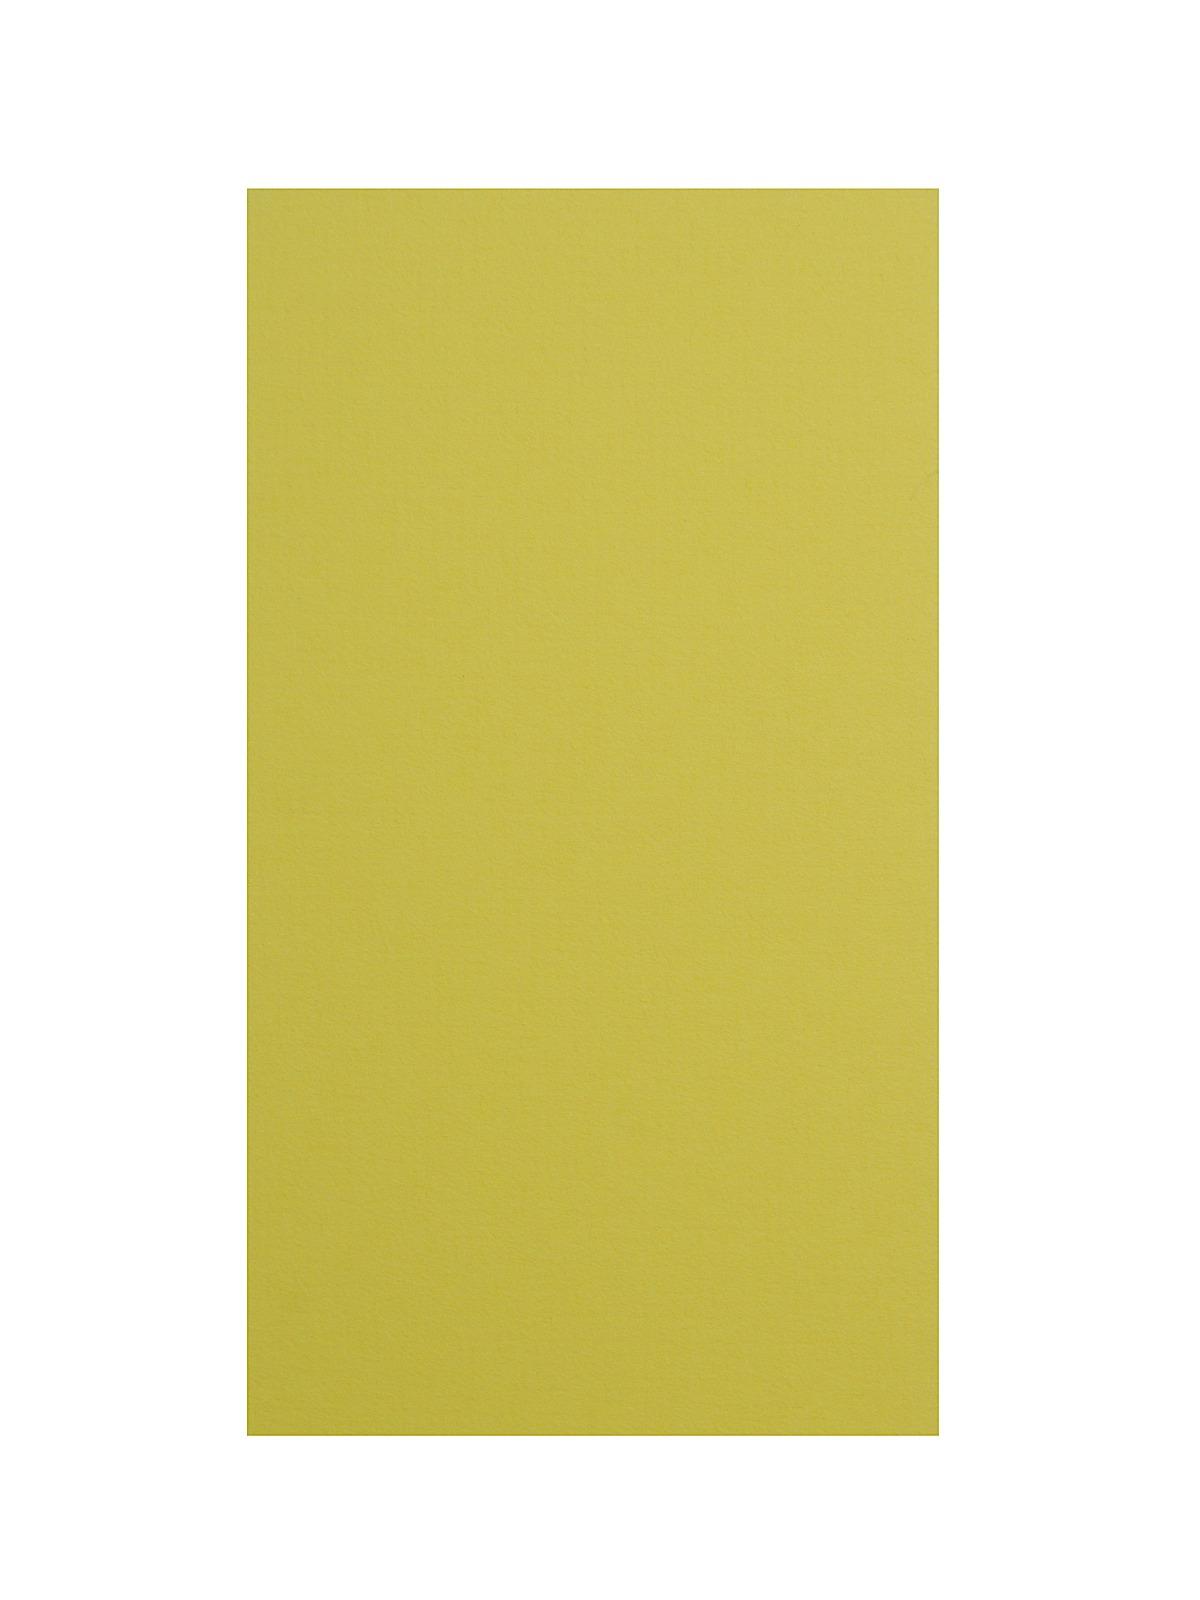 Crescent berkshire mat board misterart berkshire mat board buttercup 32 in x 40 in cream core geenschuldenfo Images